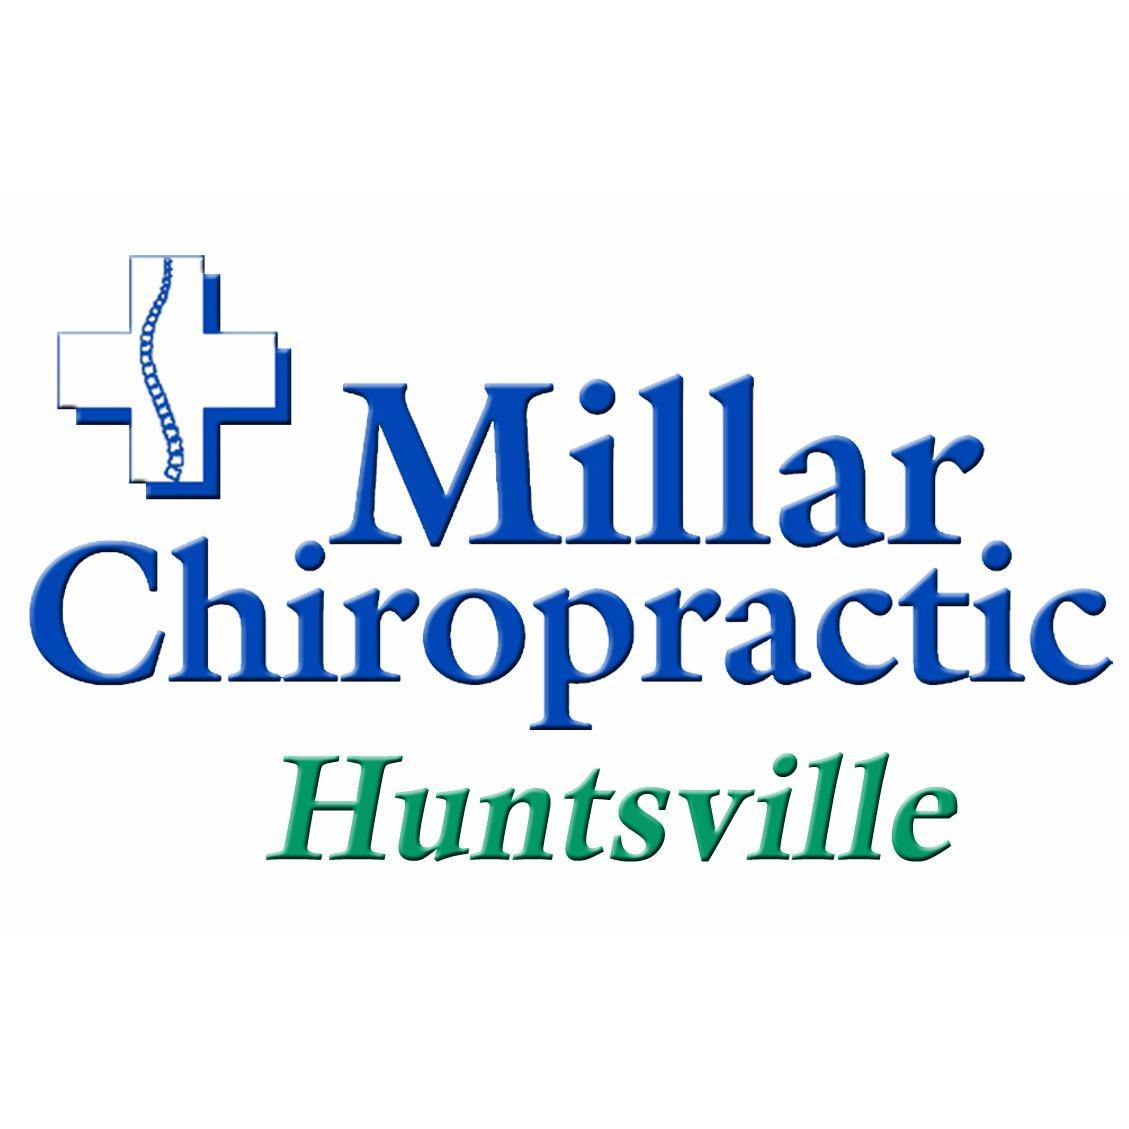 Millar Chiropractic - Huntsville AL (Downtown) - Huntsville, AL 35805 - (256)539-2000 | ShowMeLocal.com